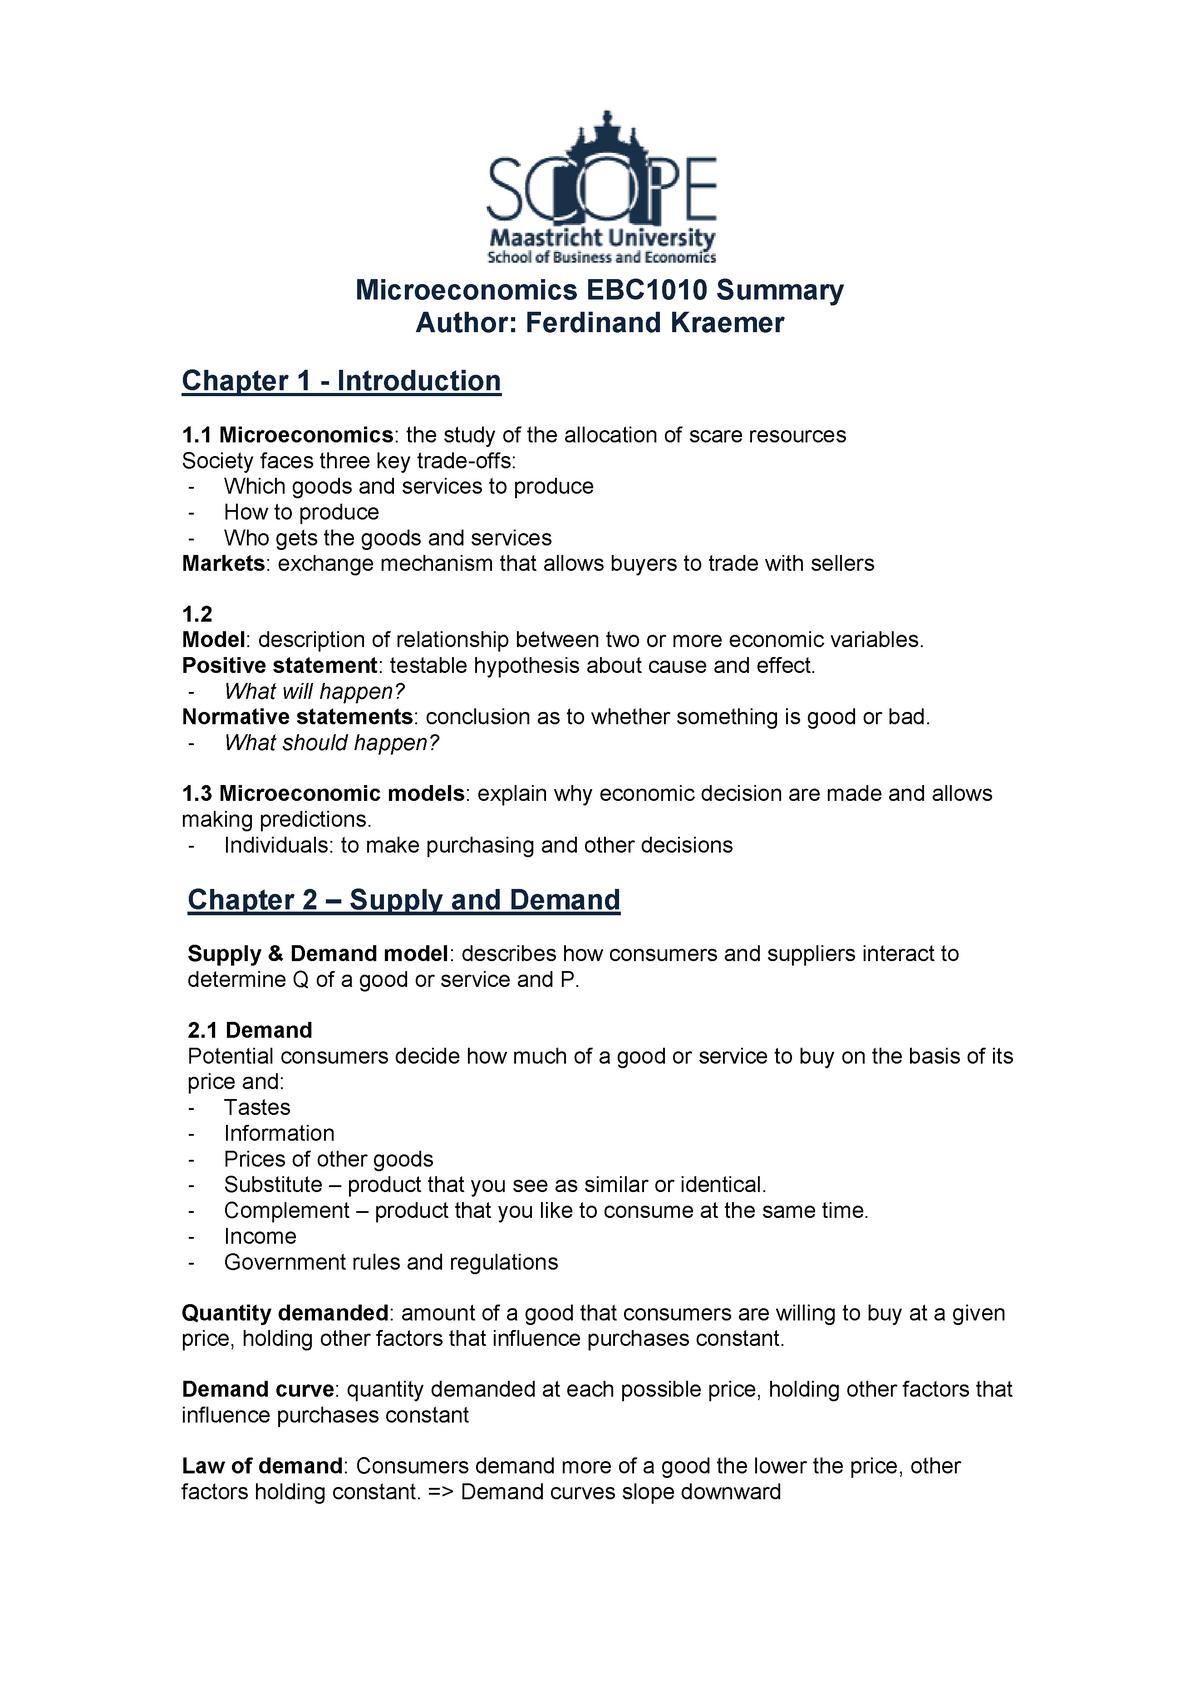 Summary Microeconomics, 1st year - EUS1008 - StuDocu